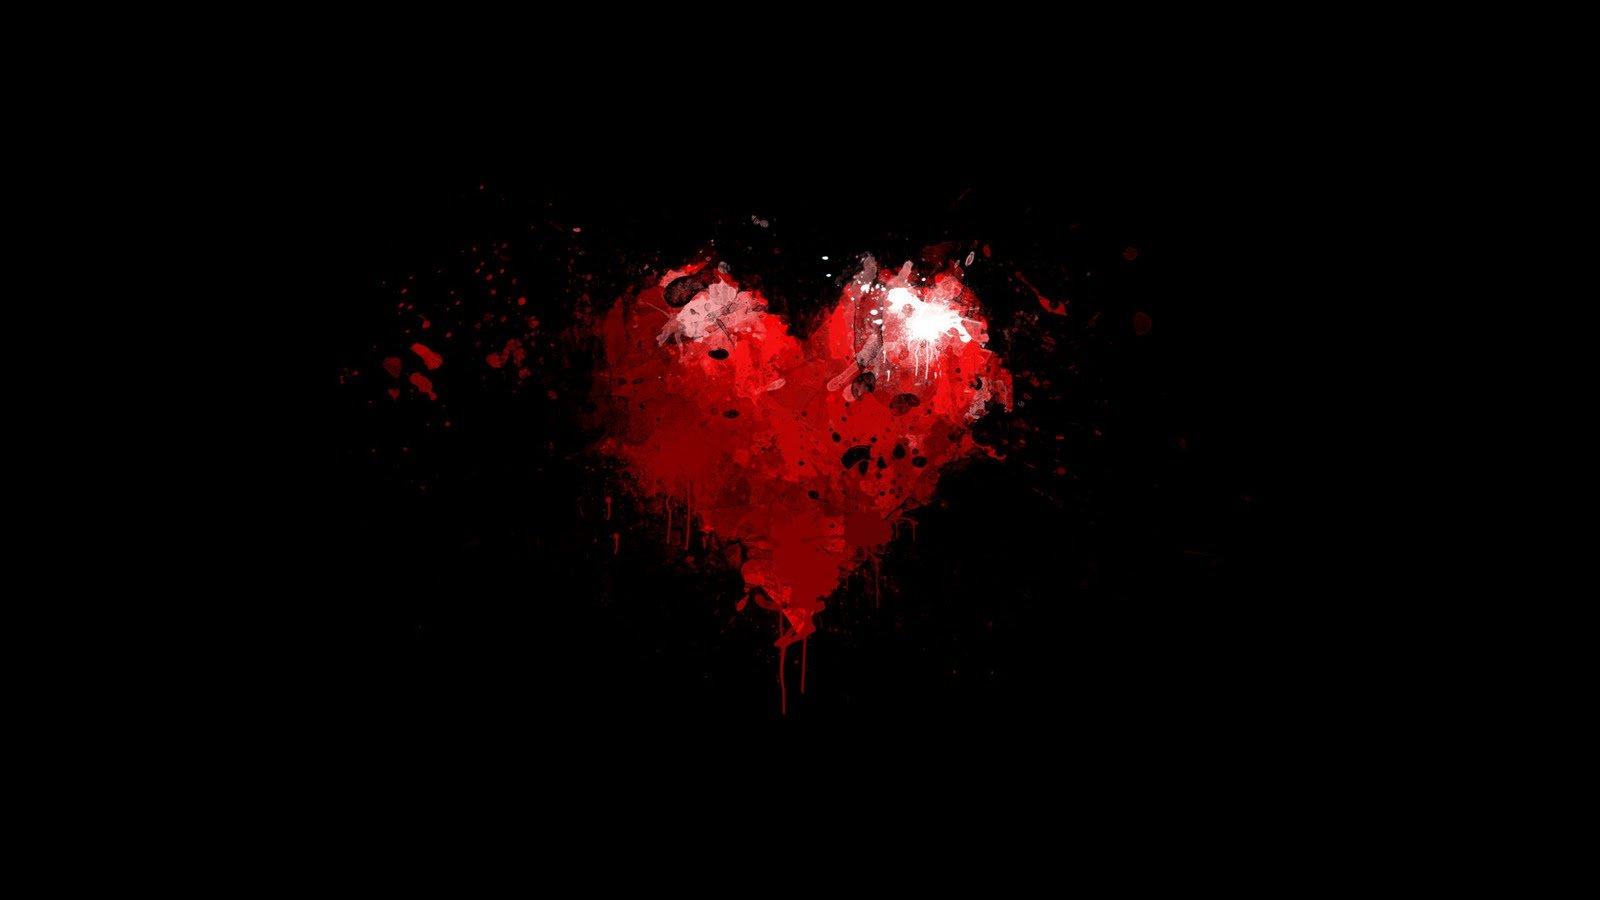 Love Heart Wallpaper Hd: HD Heart Wallpaper